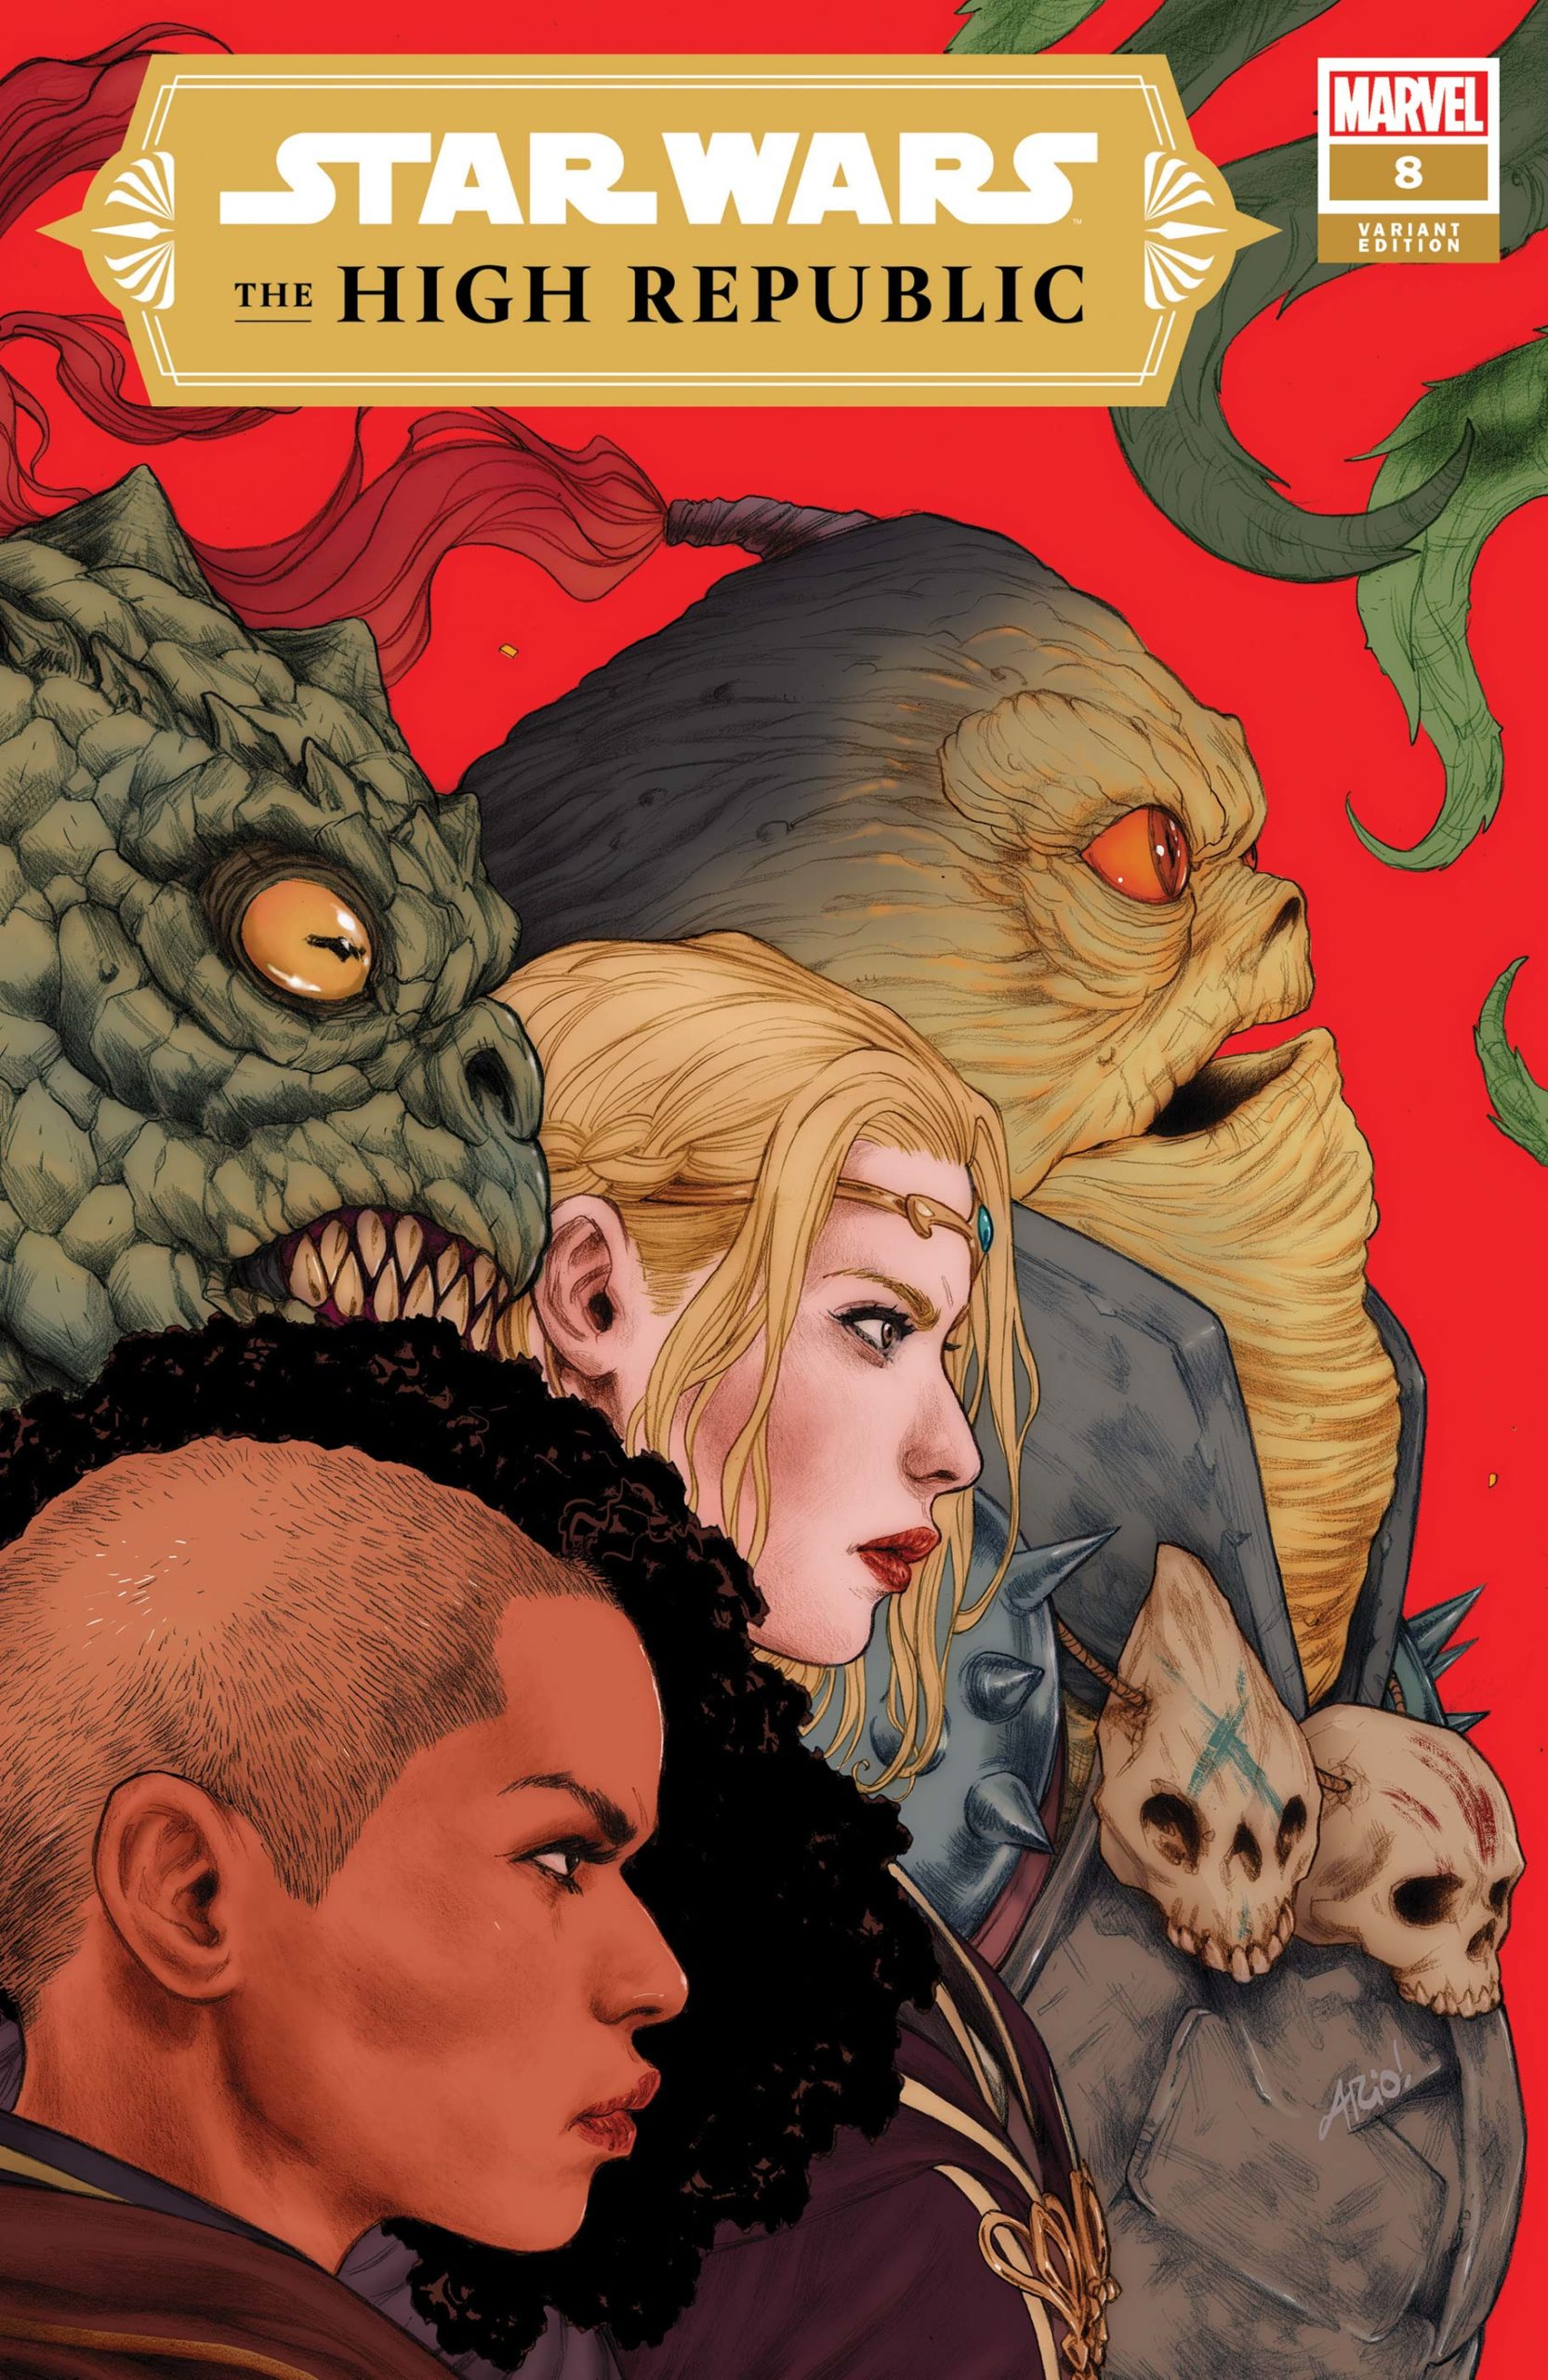 The High Republic #8 (Ario Anindito Variant Cover) (11.08.2021)